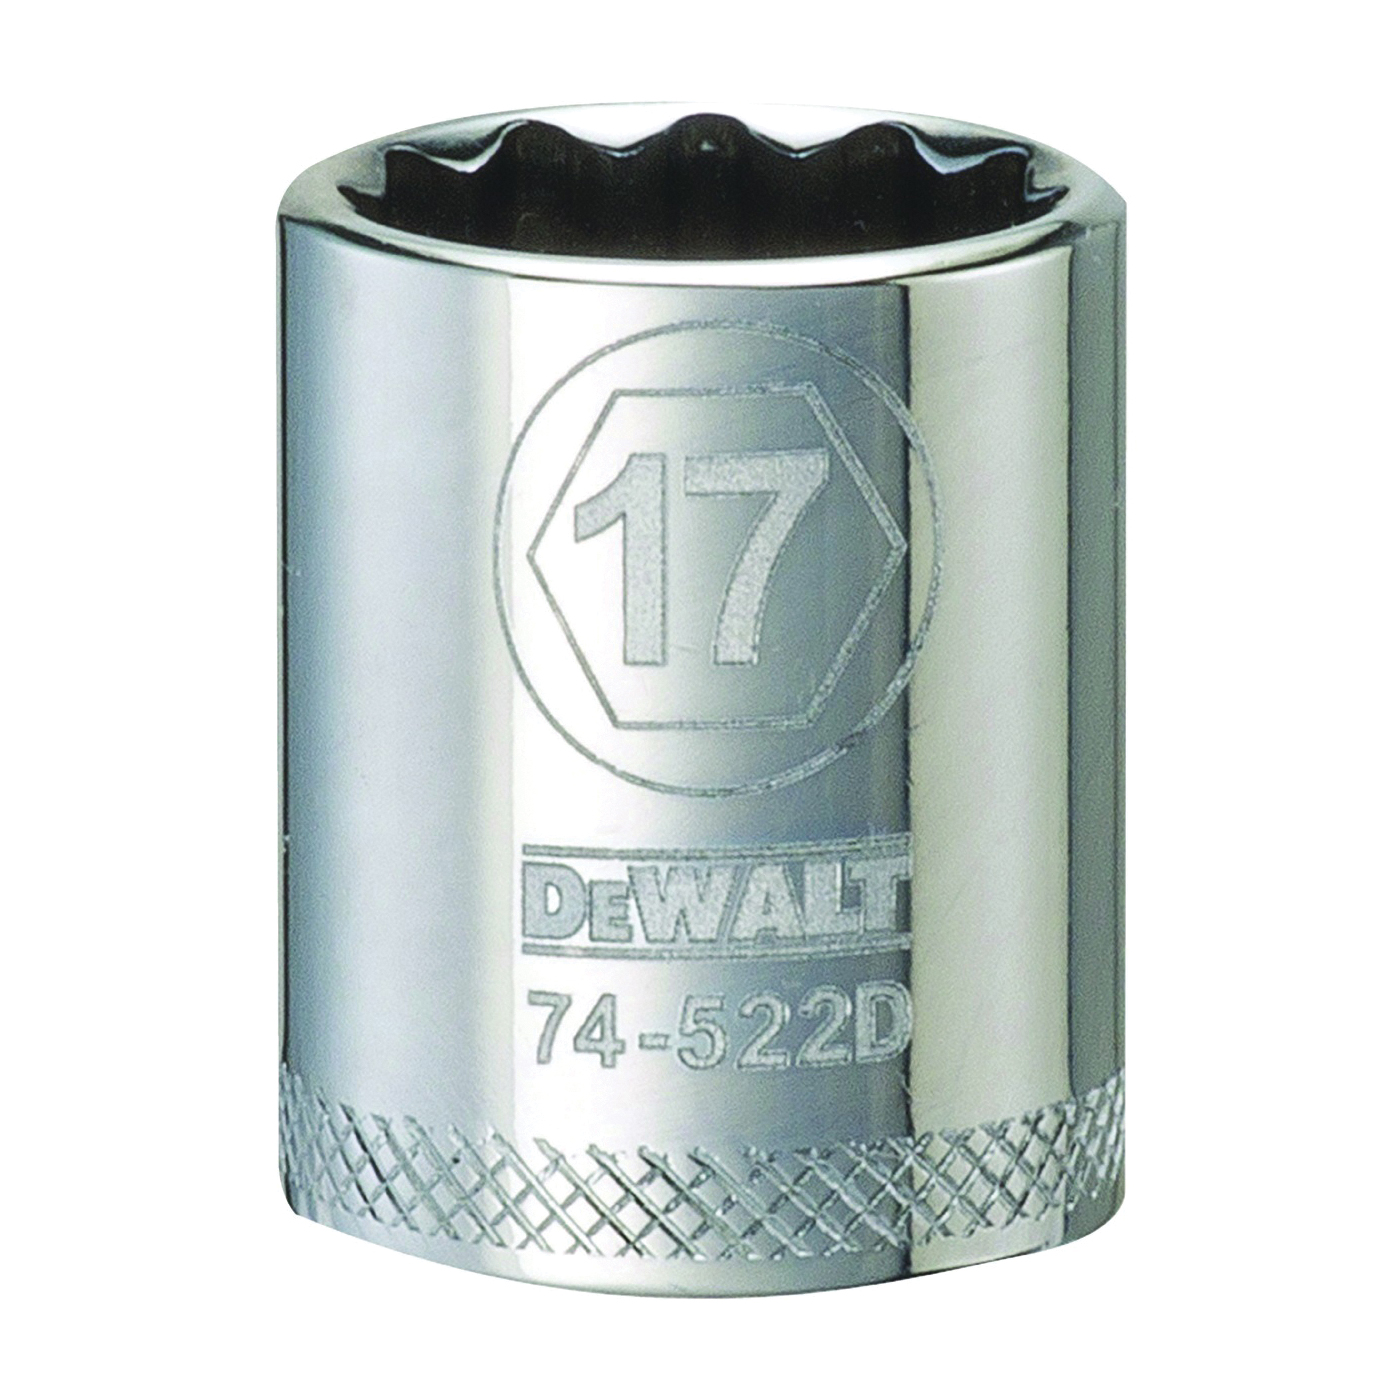 Picture of DeWALT DWMT74522OSP Hand Socket, 17 mm Socket, 3/8 in Drive, 12 -Point, Vanadium Steel, Polished Chrome